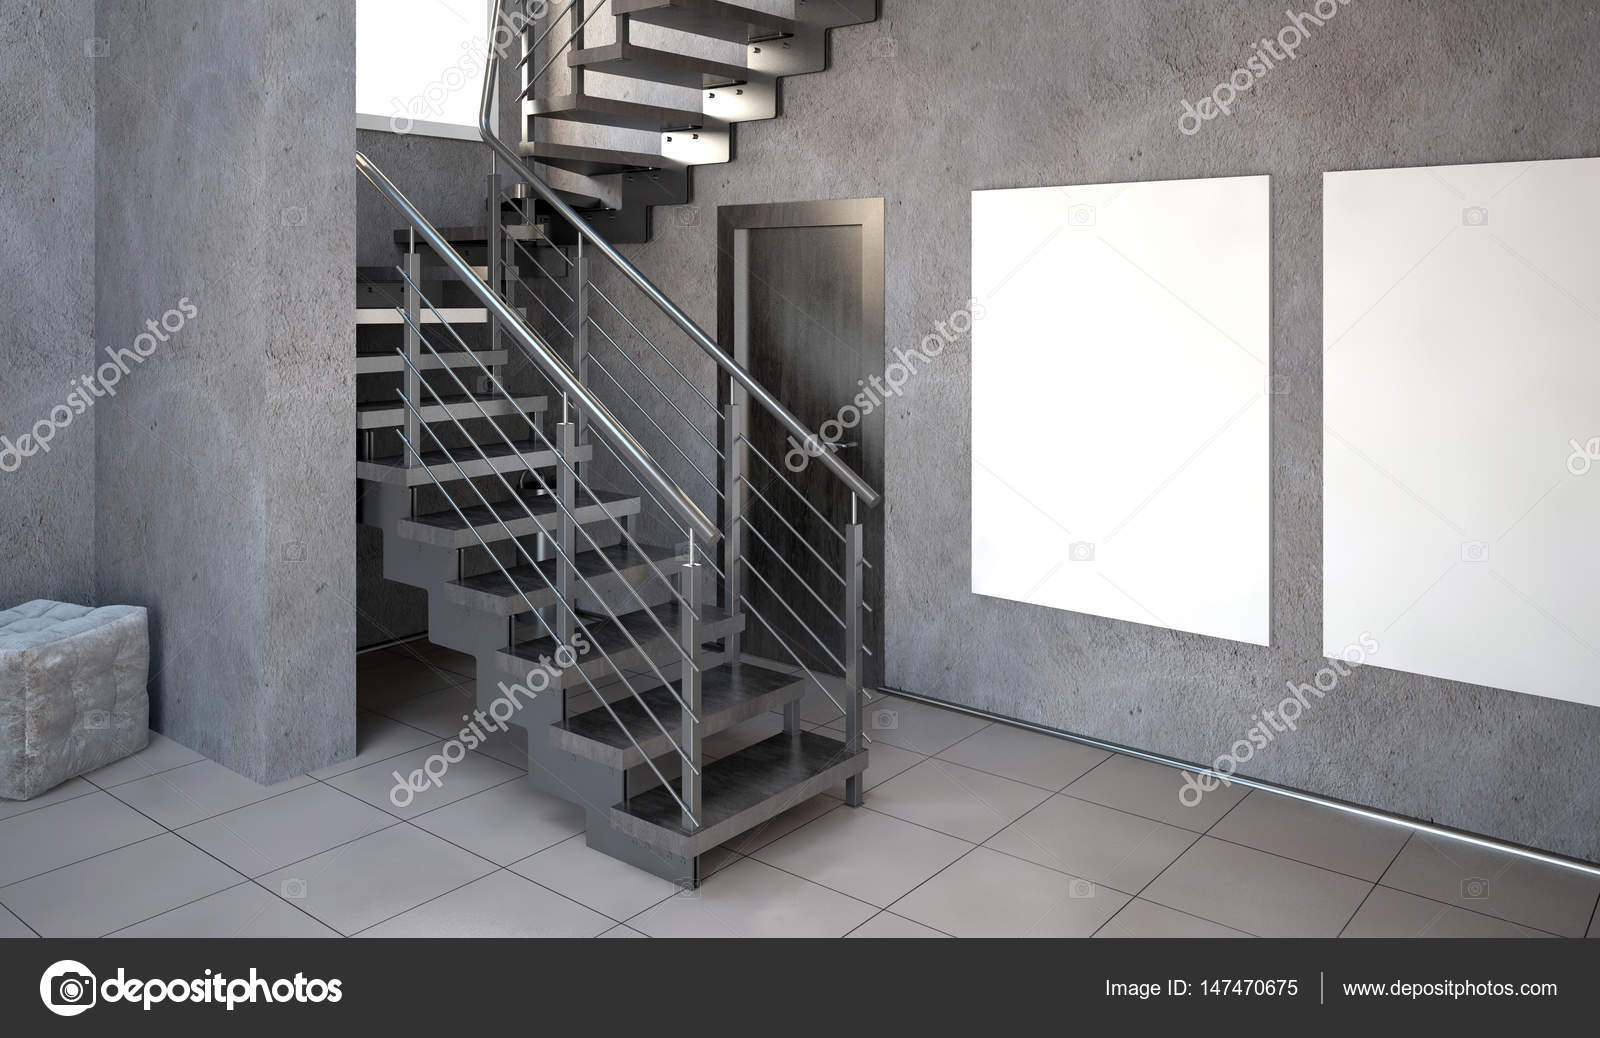 Woonkamer Interieur Stijlen : Mock up poster in interieur met trappen woonkamer hipster stijl